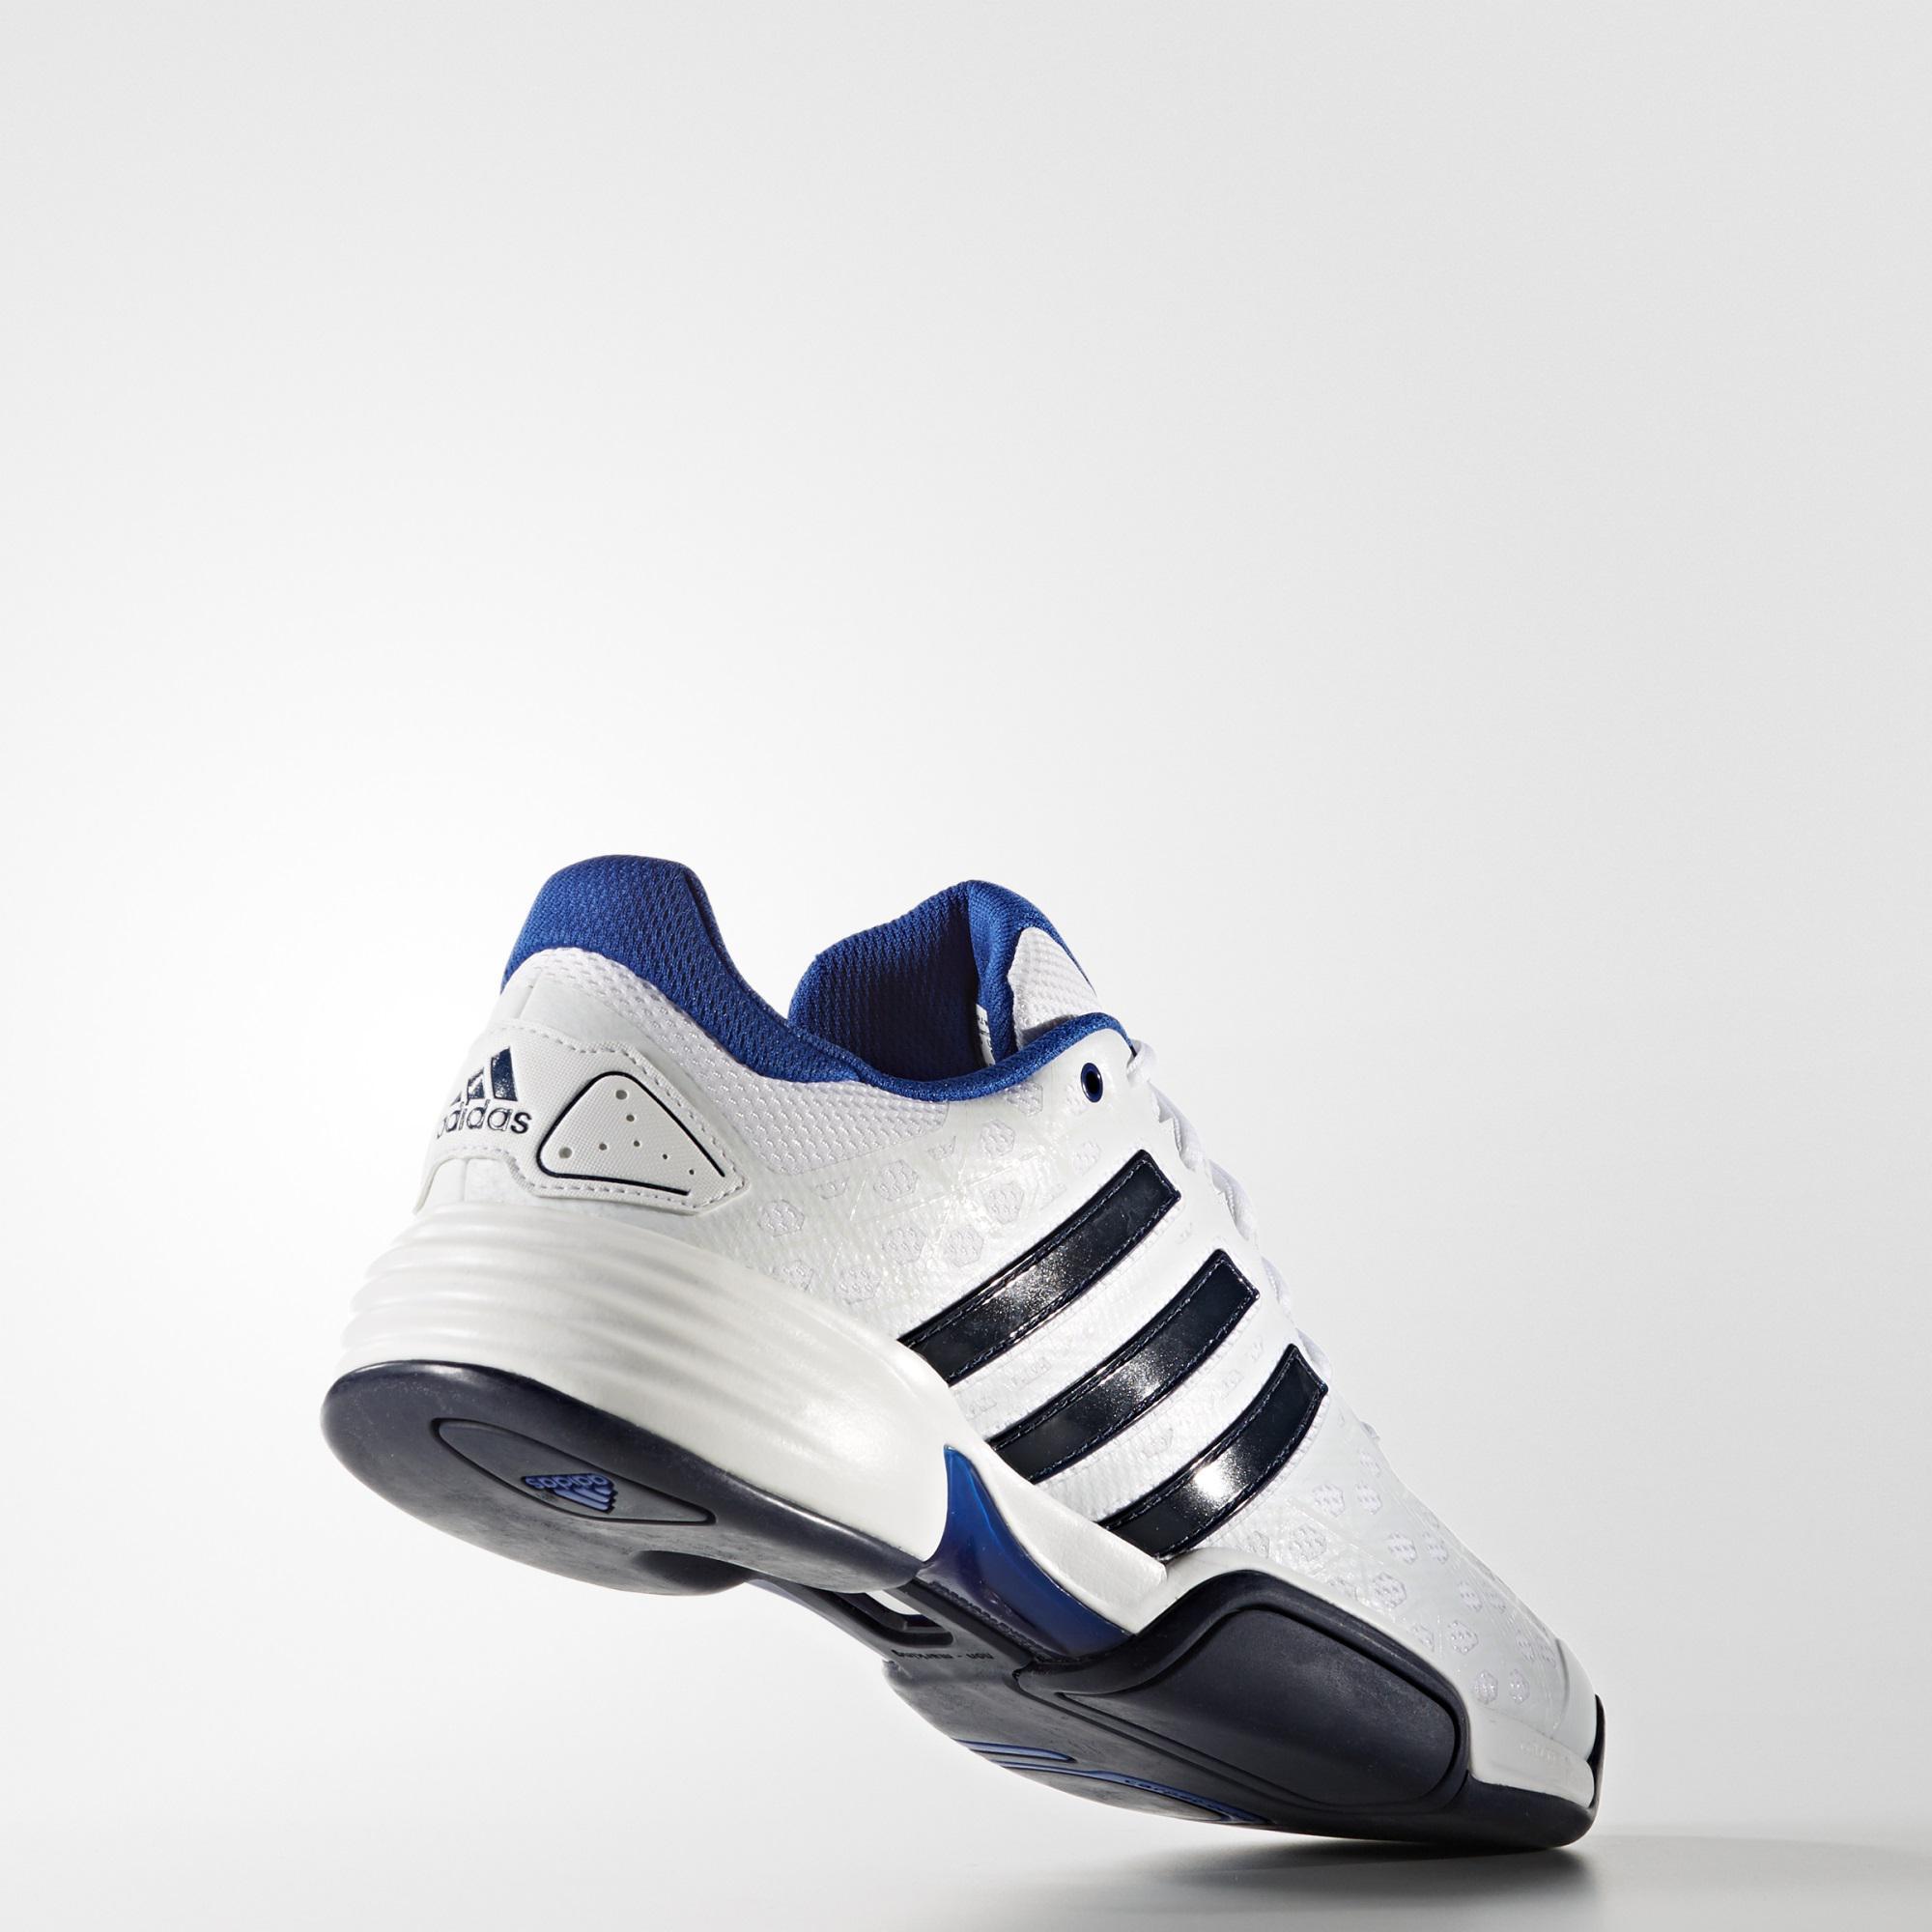 buy online 41699 547ec Adidas Durable Limited Men Black Blue White Club Running Shoes